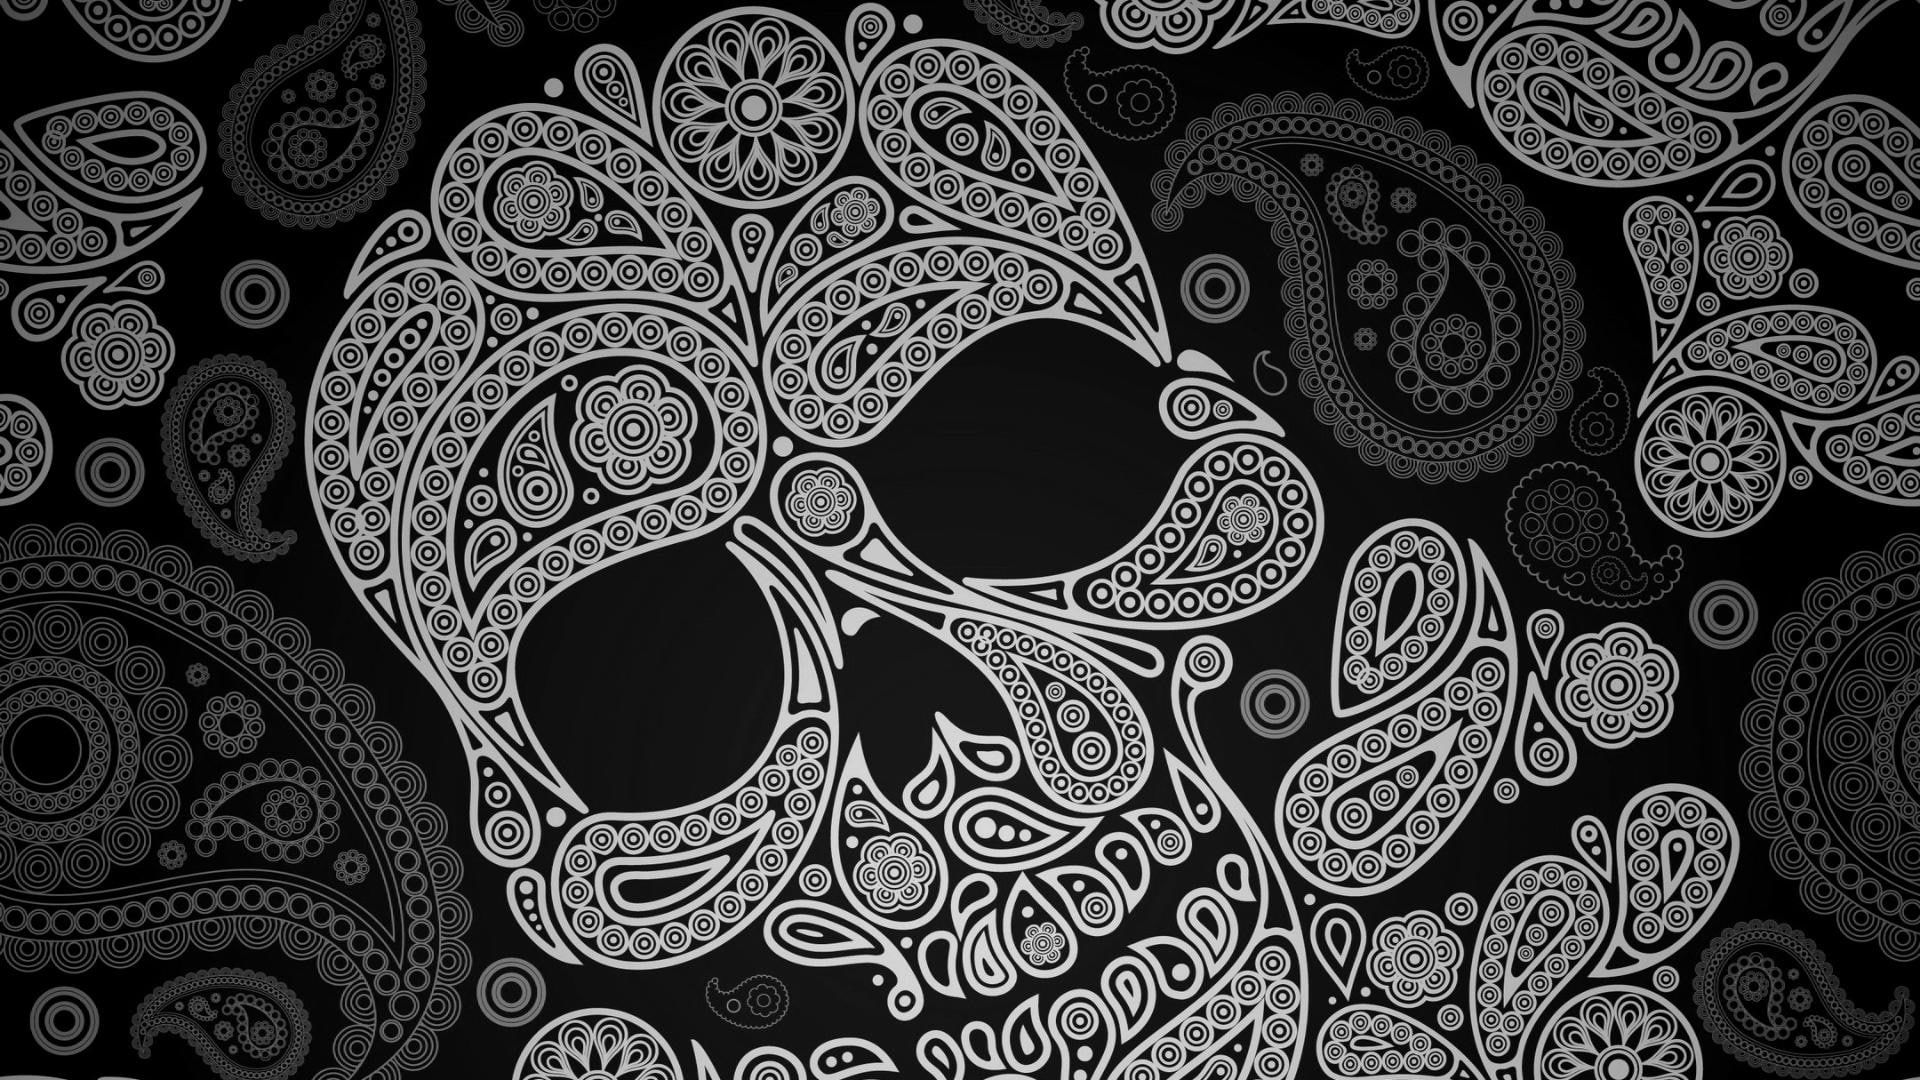 Paisley Skull Pattern Paisley Skull Pattern 1080p Wallpaper Hdwallpaper Desktop In 2020 Skull Wallpaper Sugar Skull Wallpaper Black Skulls Wallpaper